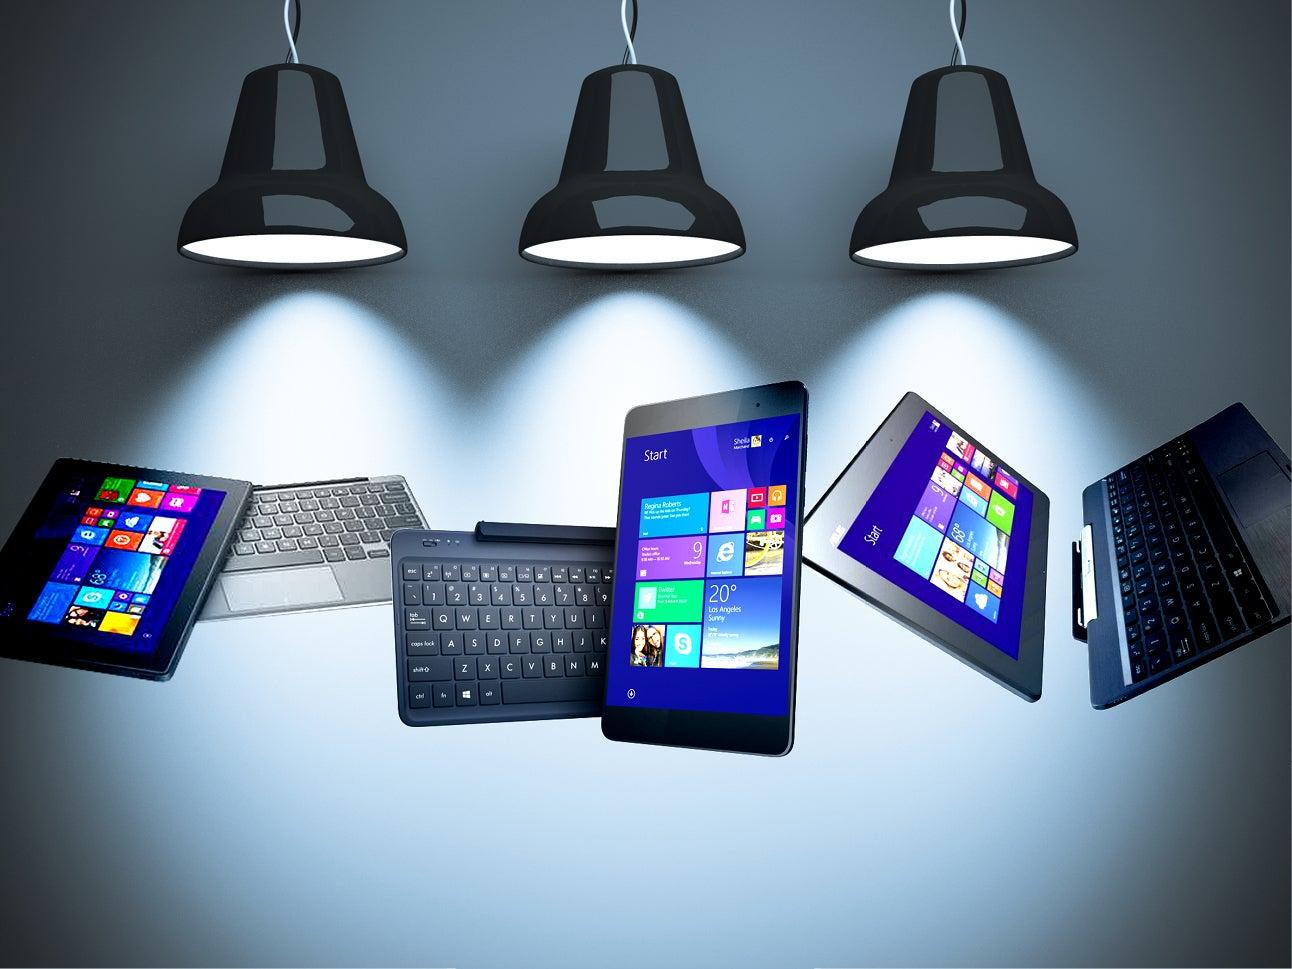 7 Inexpensive Surface Pro 4 Alternatives Cio Flashdisk Toshiba 2 Gb See Larger Image